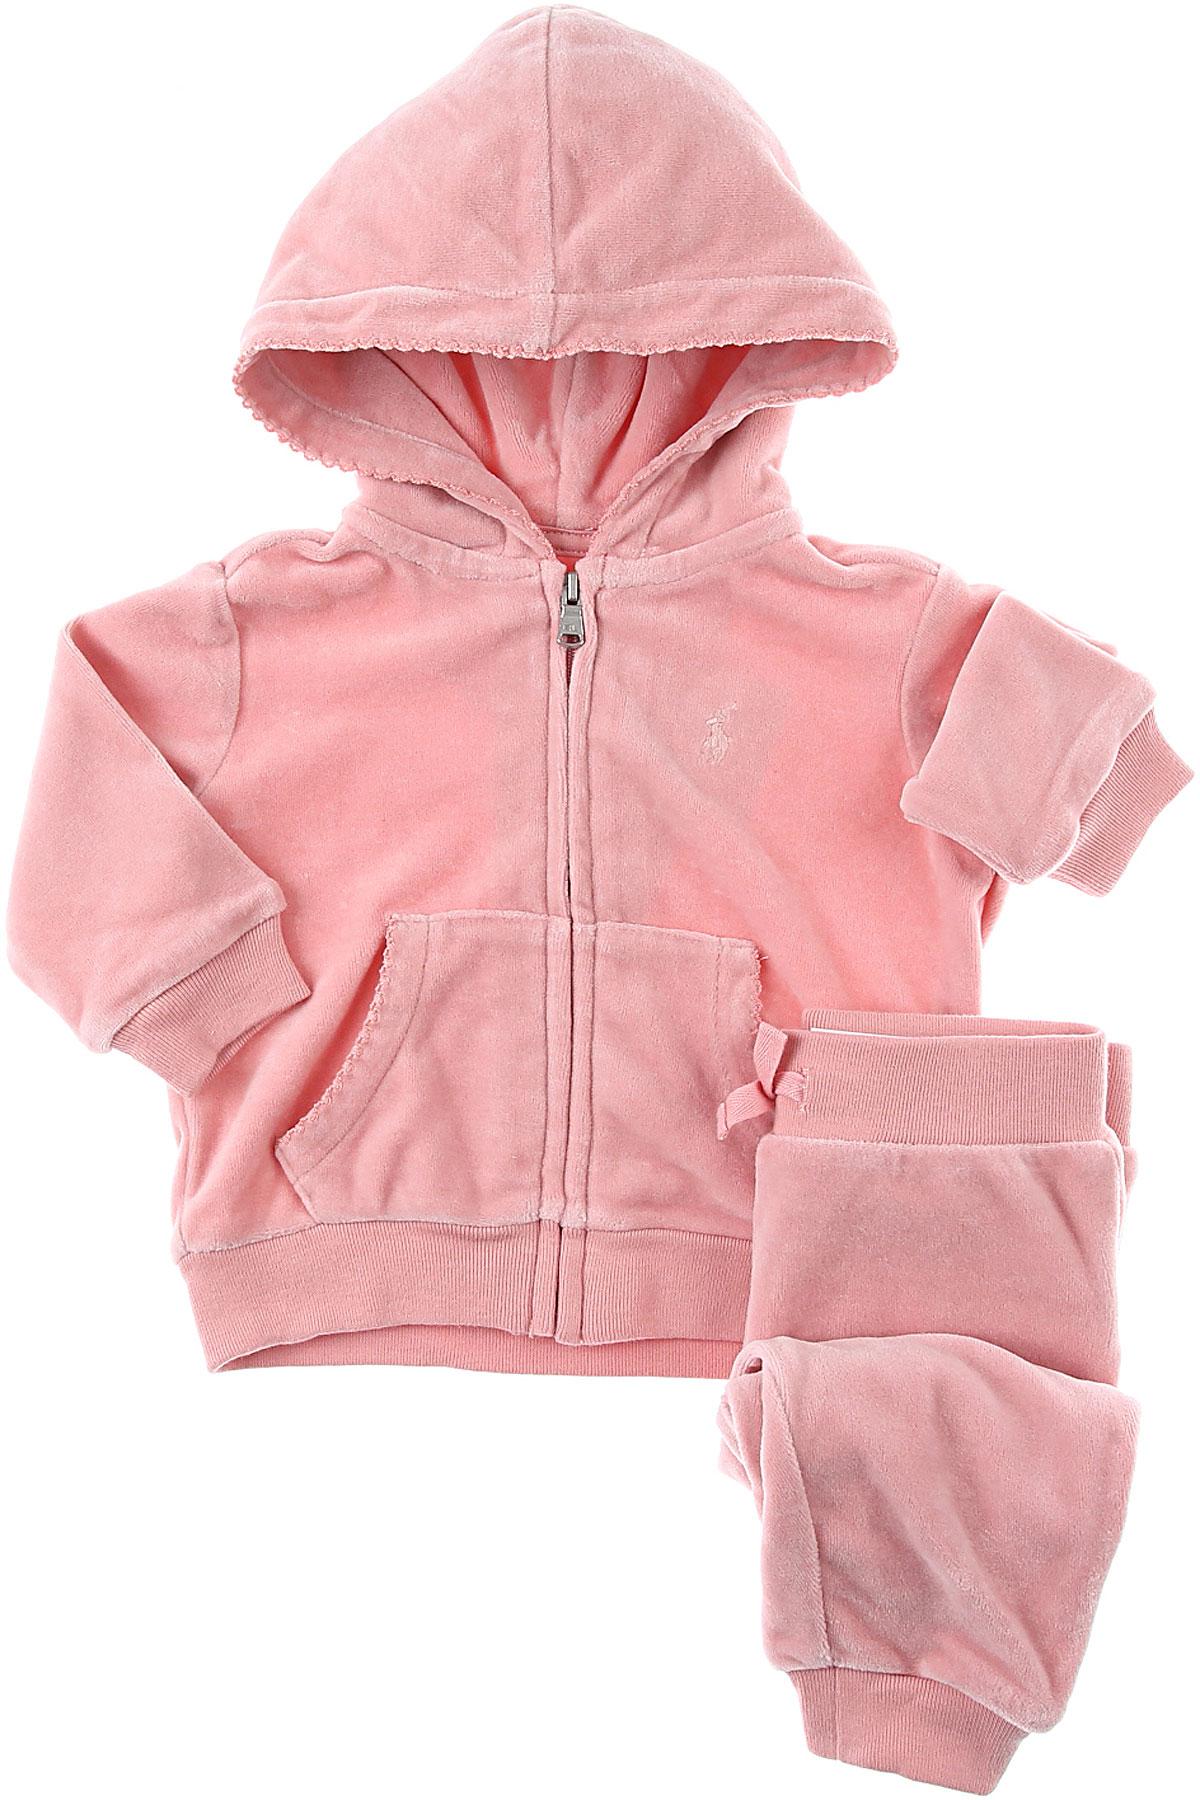 Ralph Lauren Baby Sets for Girls On Sale, Pink, Cotton, 2019, 12M 12M 18M 2Y 3M 6M 9M 9M